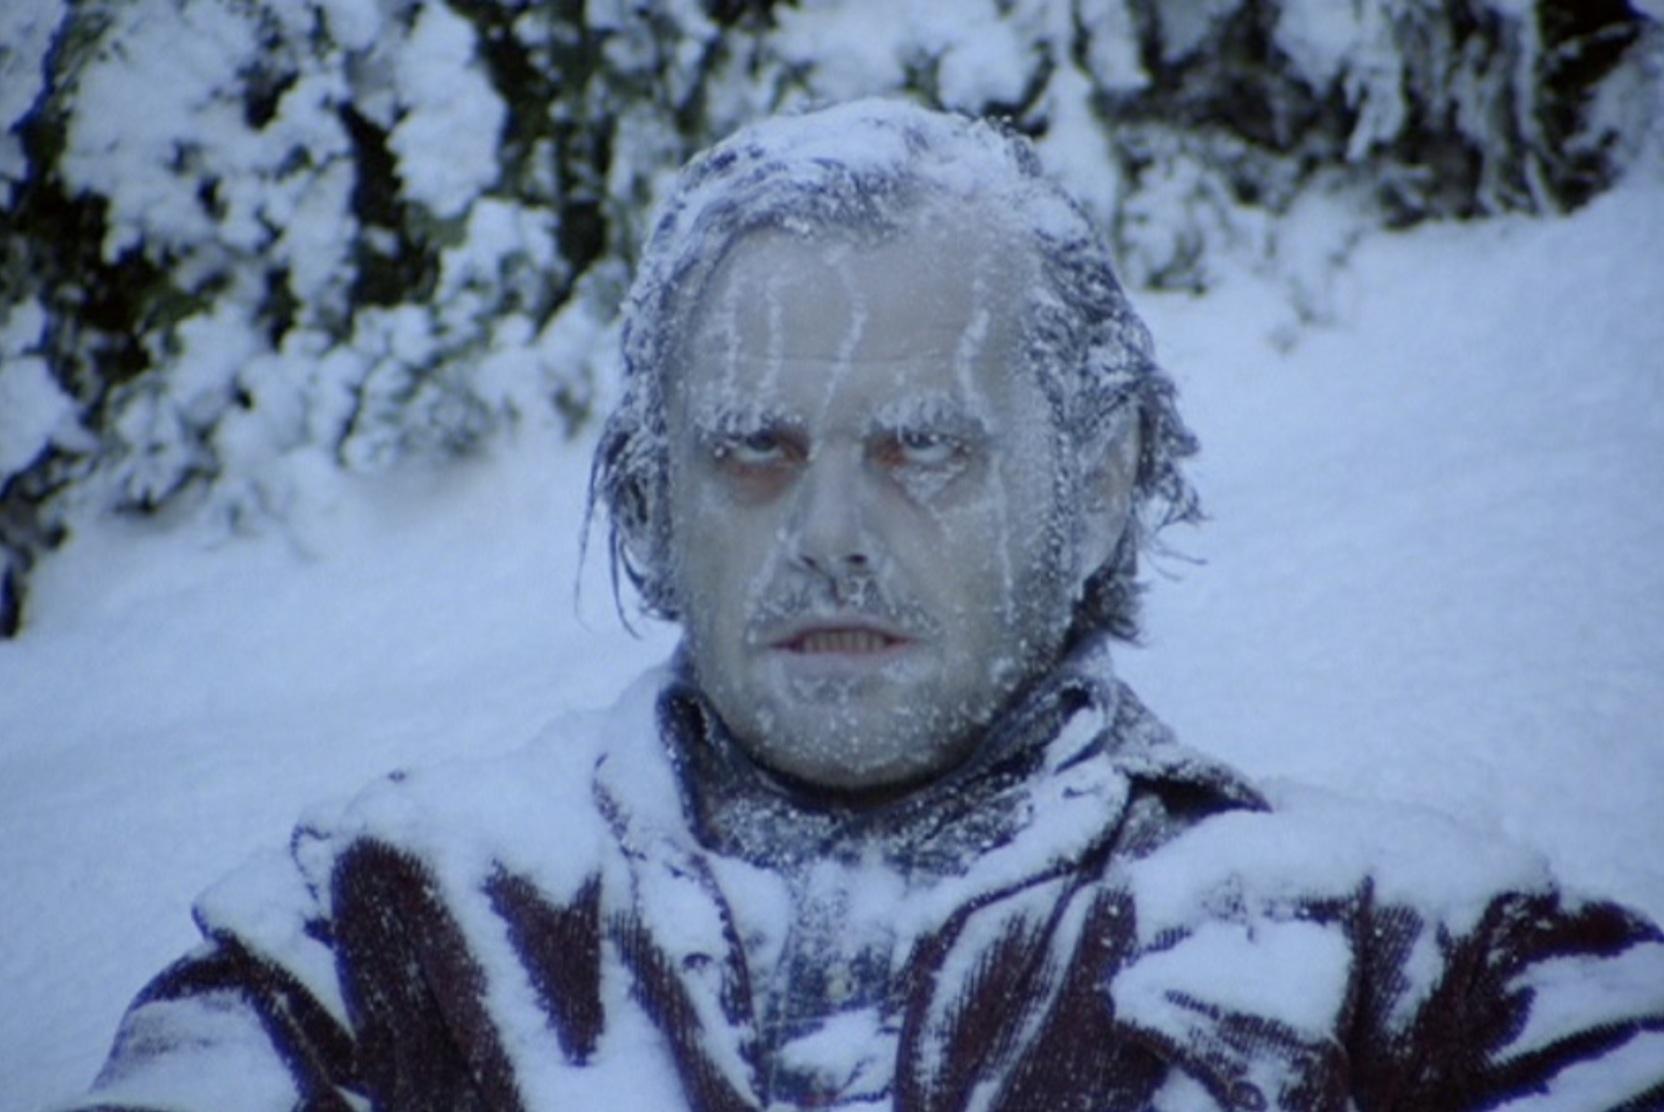 Синоптики прогнозируют морозы до минус 50 градусов в Якутии